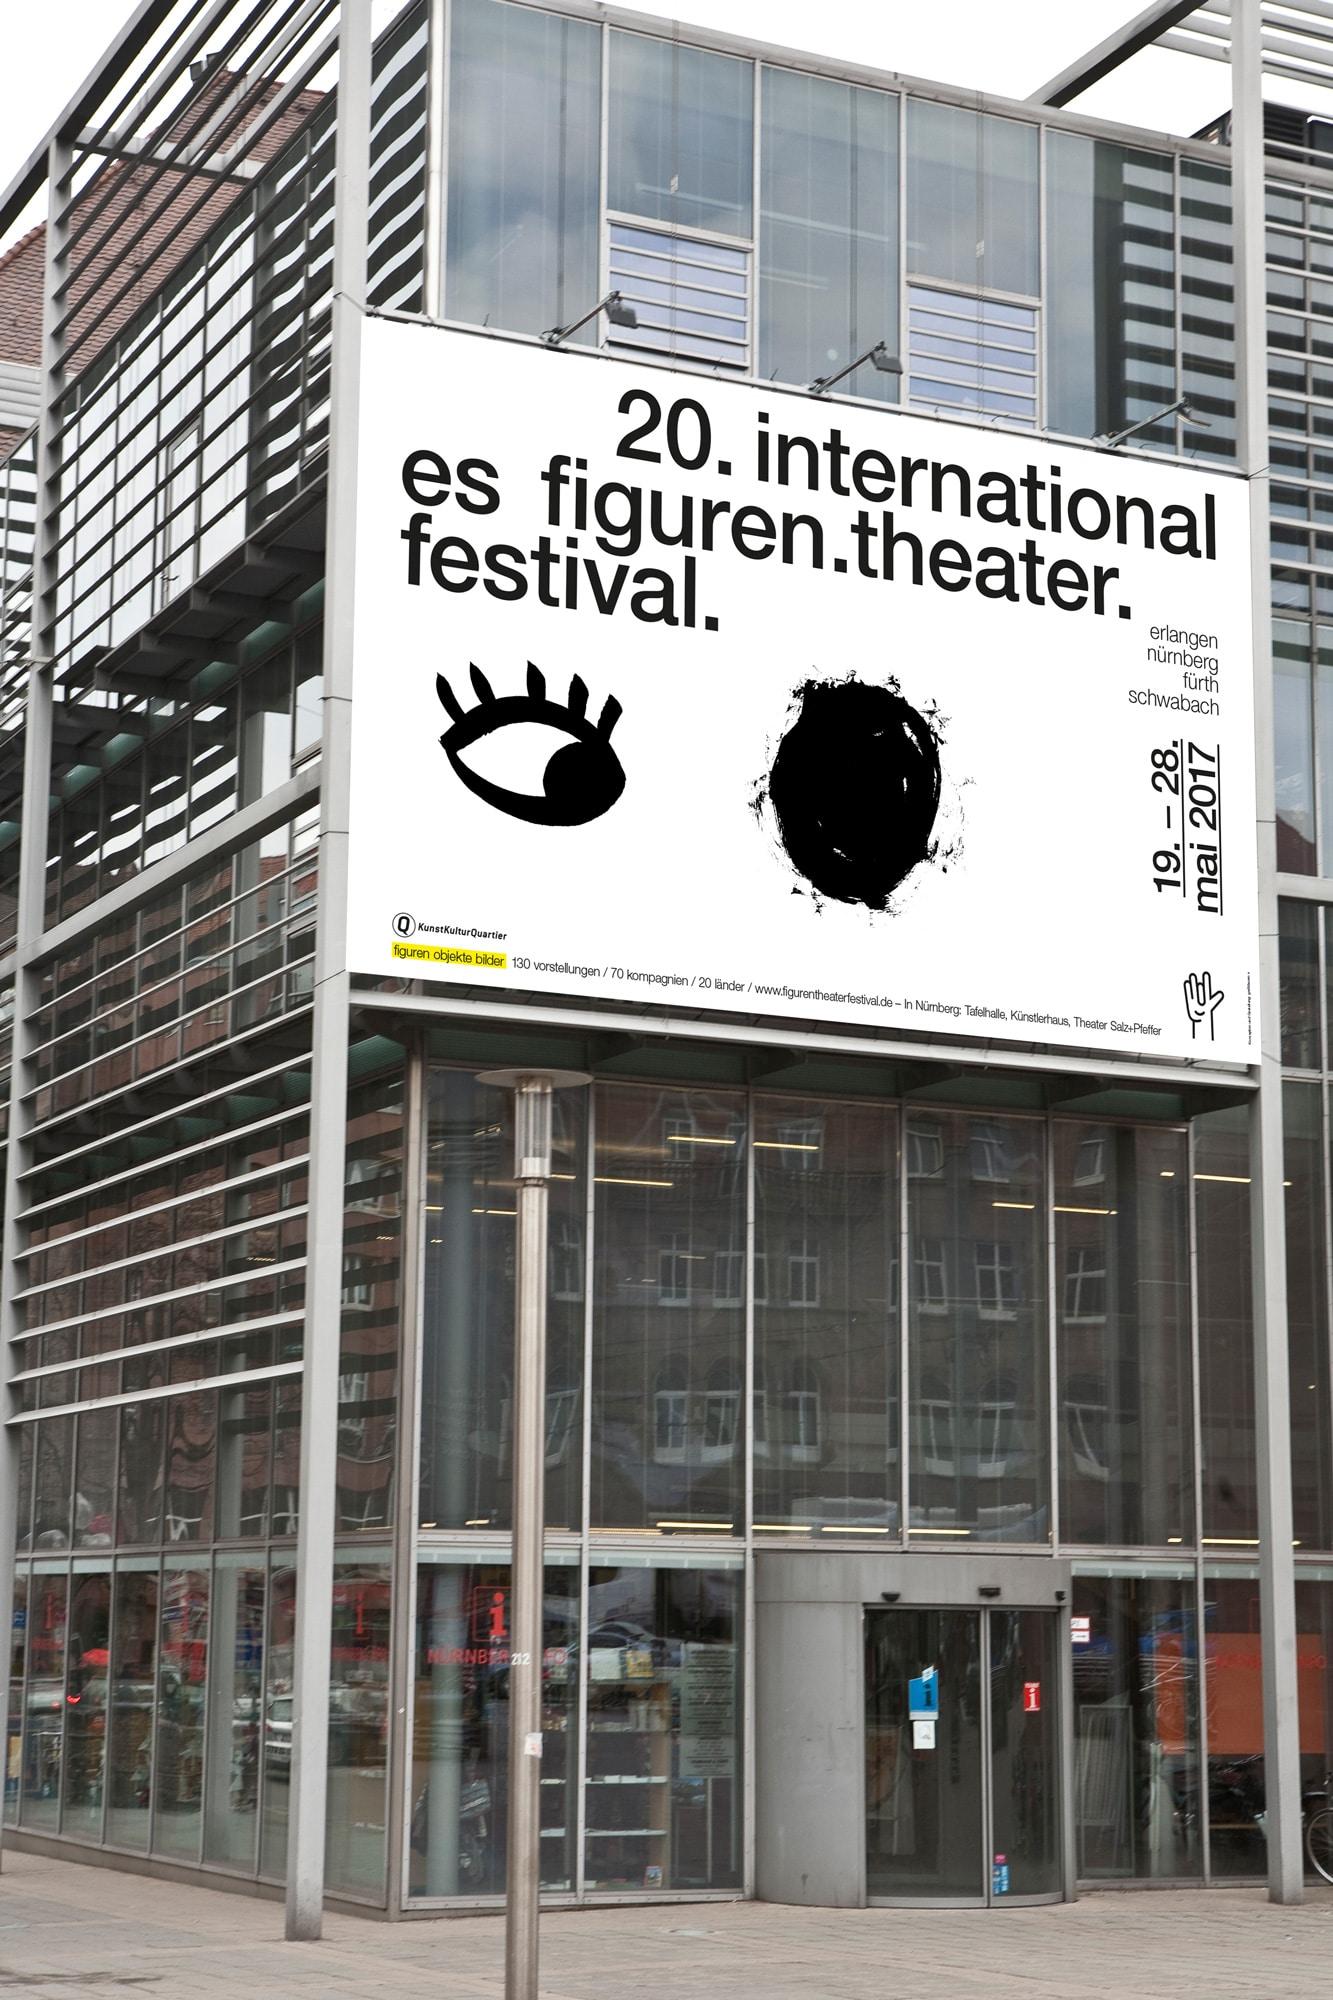 planx-internatiobnales.figuren.theater.festiva-kuenstlerhaus